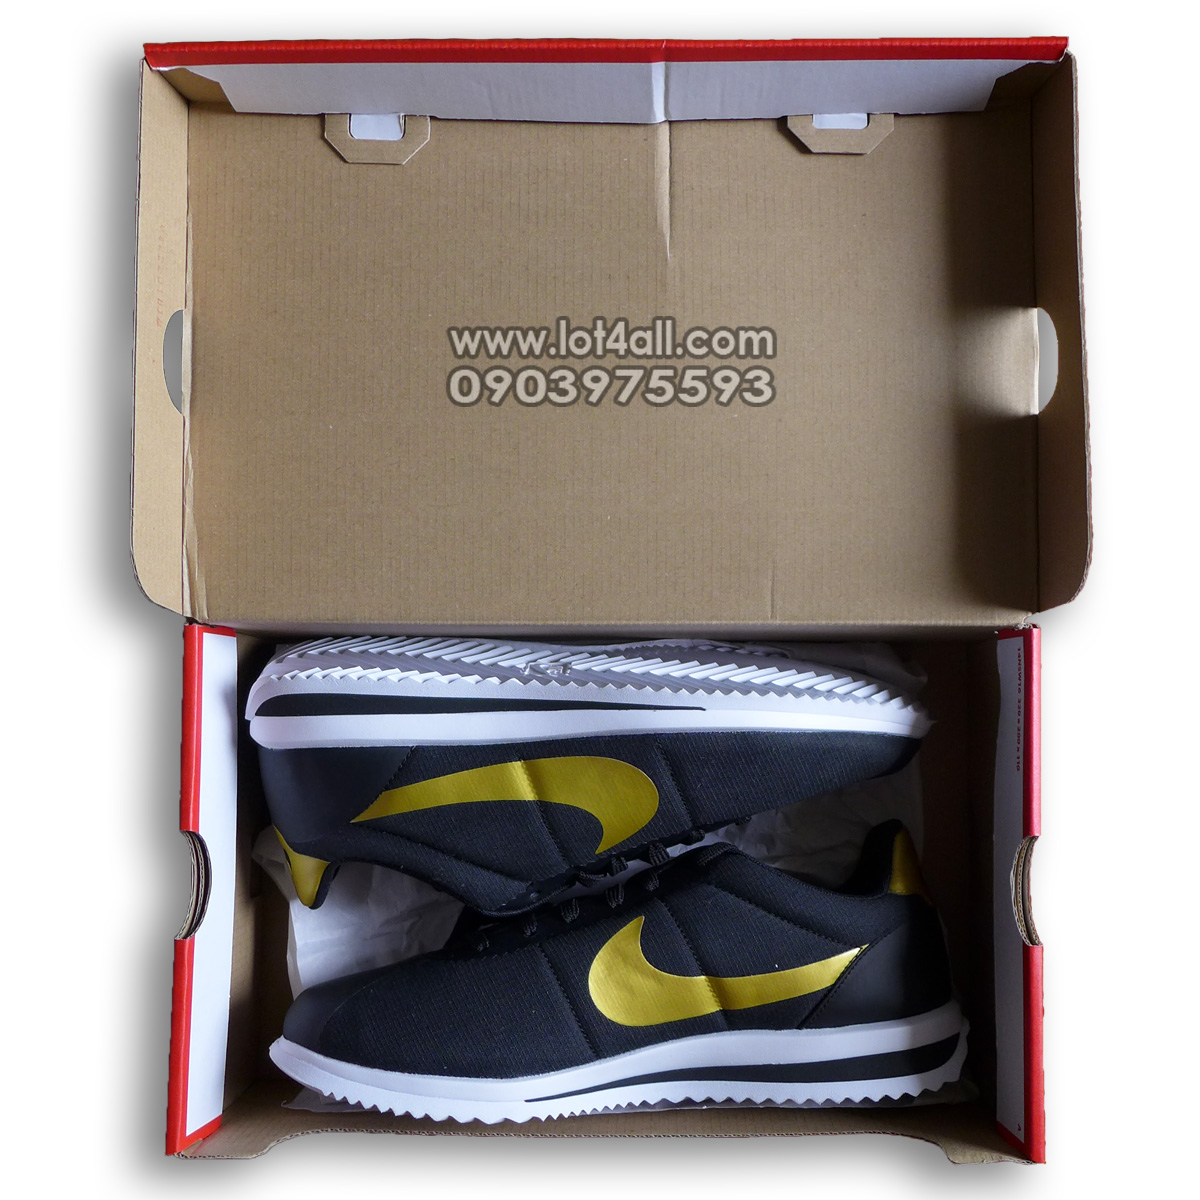 Giày nam Nike Cortez Ultra QS Black Metallic Gold